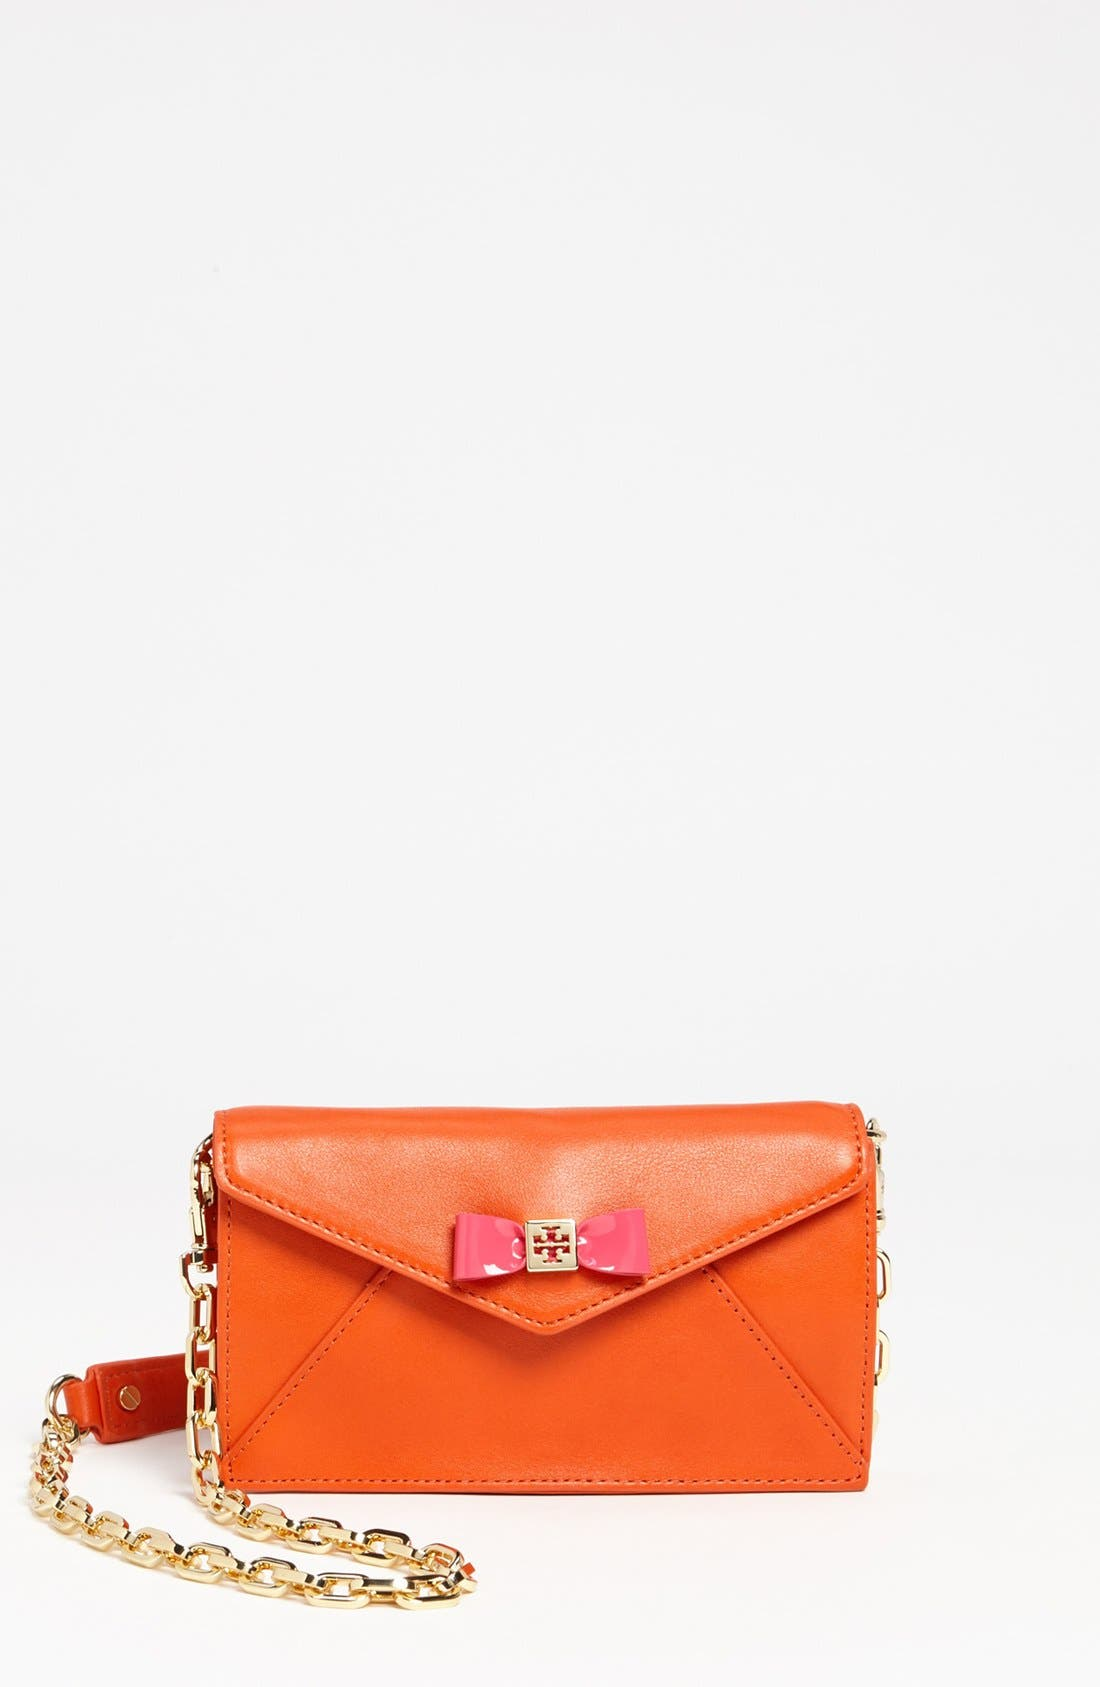 Alternate Image 1 Selected - Tory Burch 'Bow Envelope - Mini' Crossbody Bag